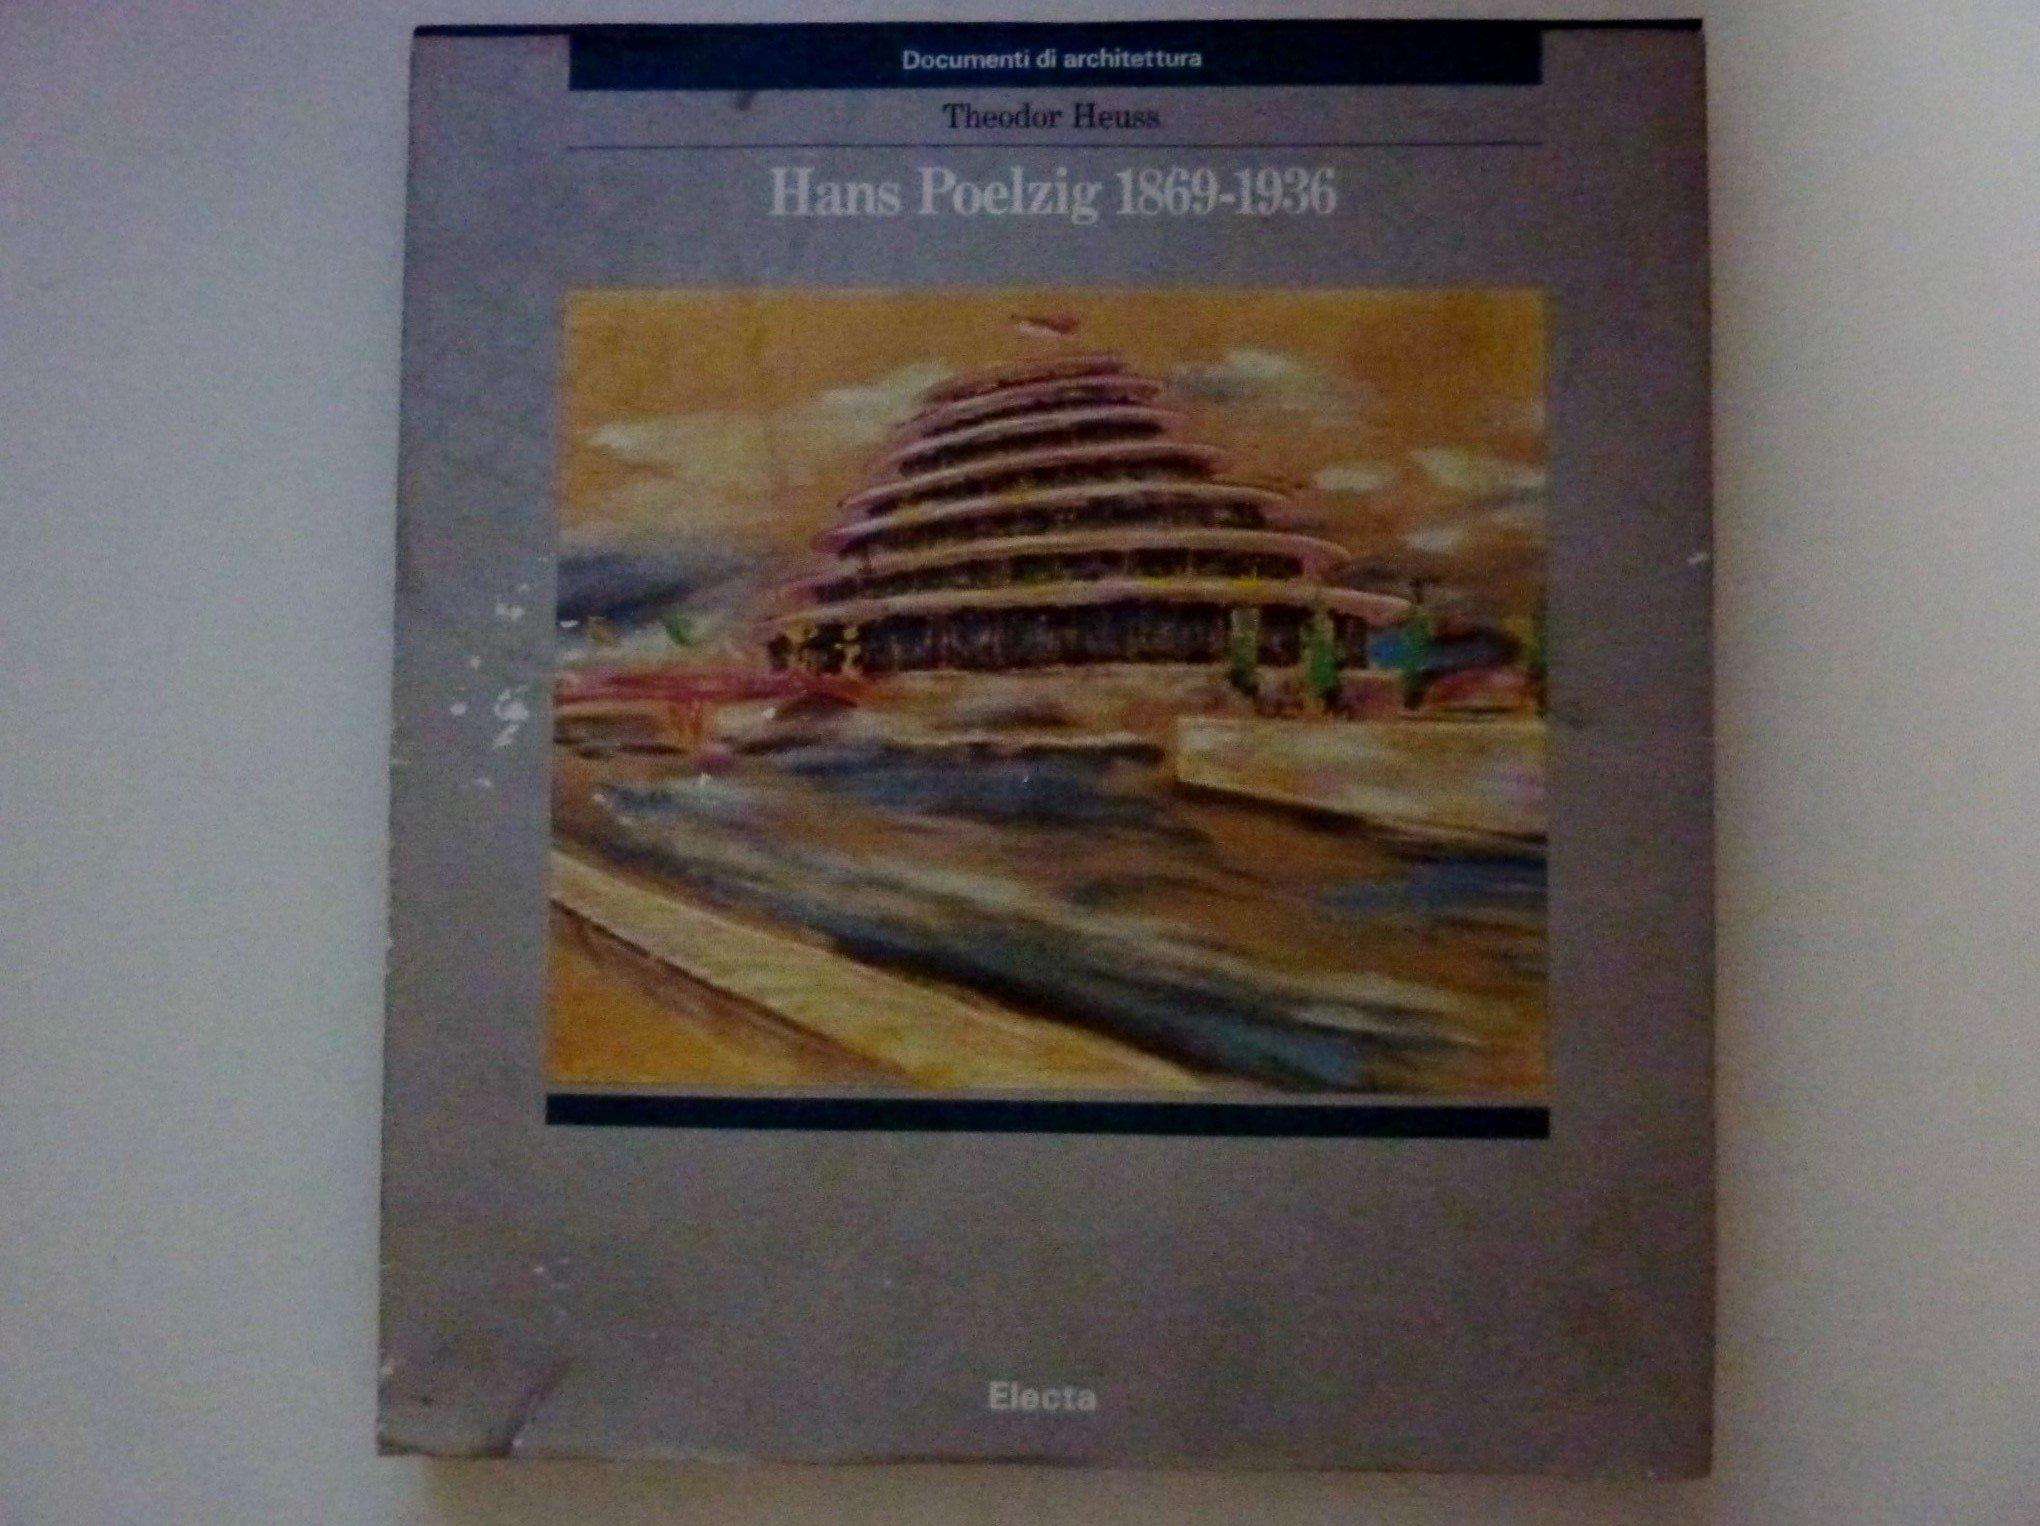 Hans Poelzig 1869-1936. Ediz. illustrata Copertina flessibile – 1 gen 1997 T. Heuss Mondadori Electa 8843535854 ARCHITETTURA